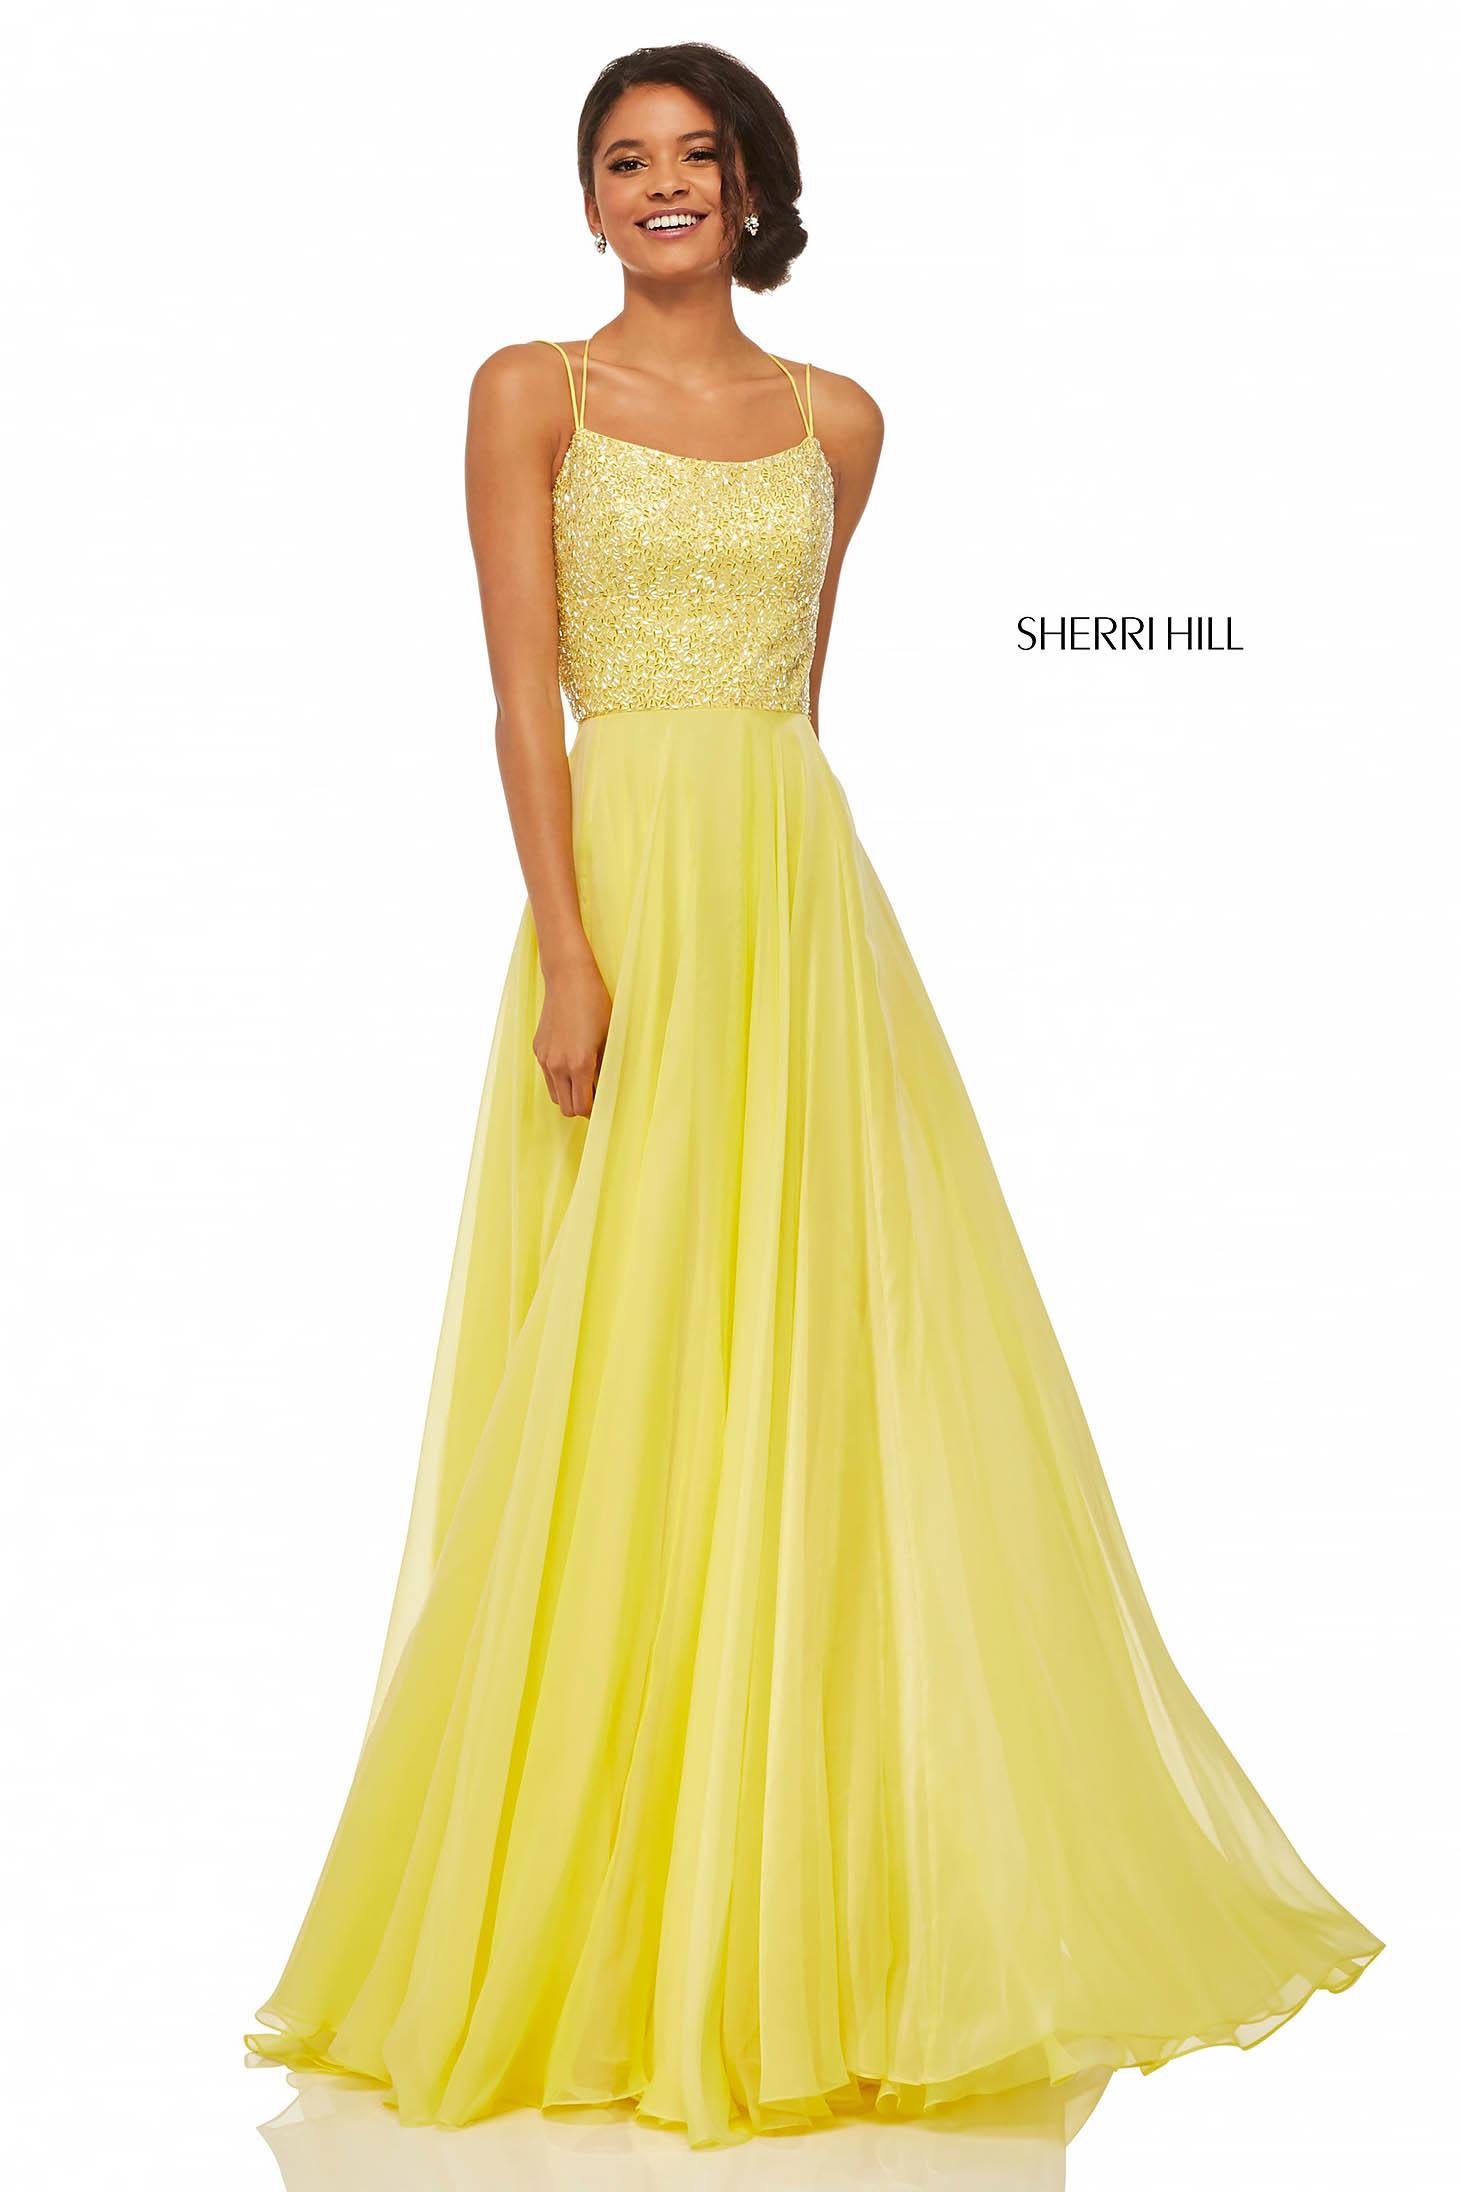 Sherri Hill 52591 Yellow Dress